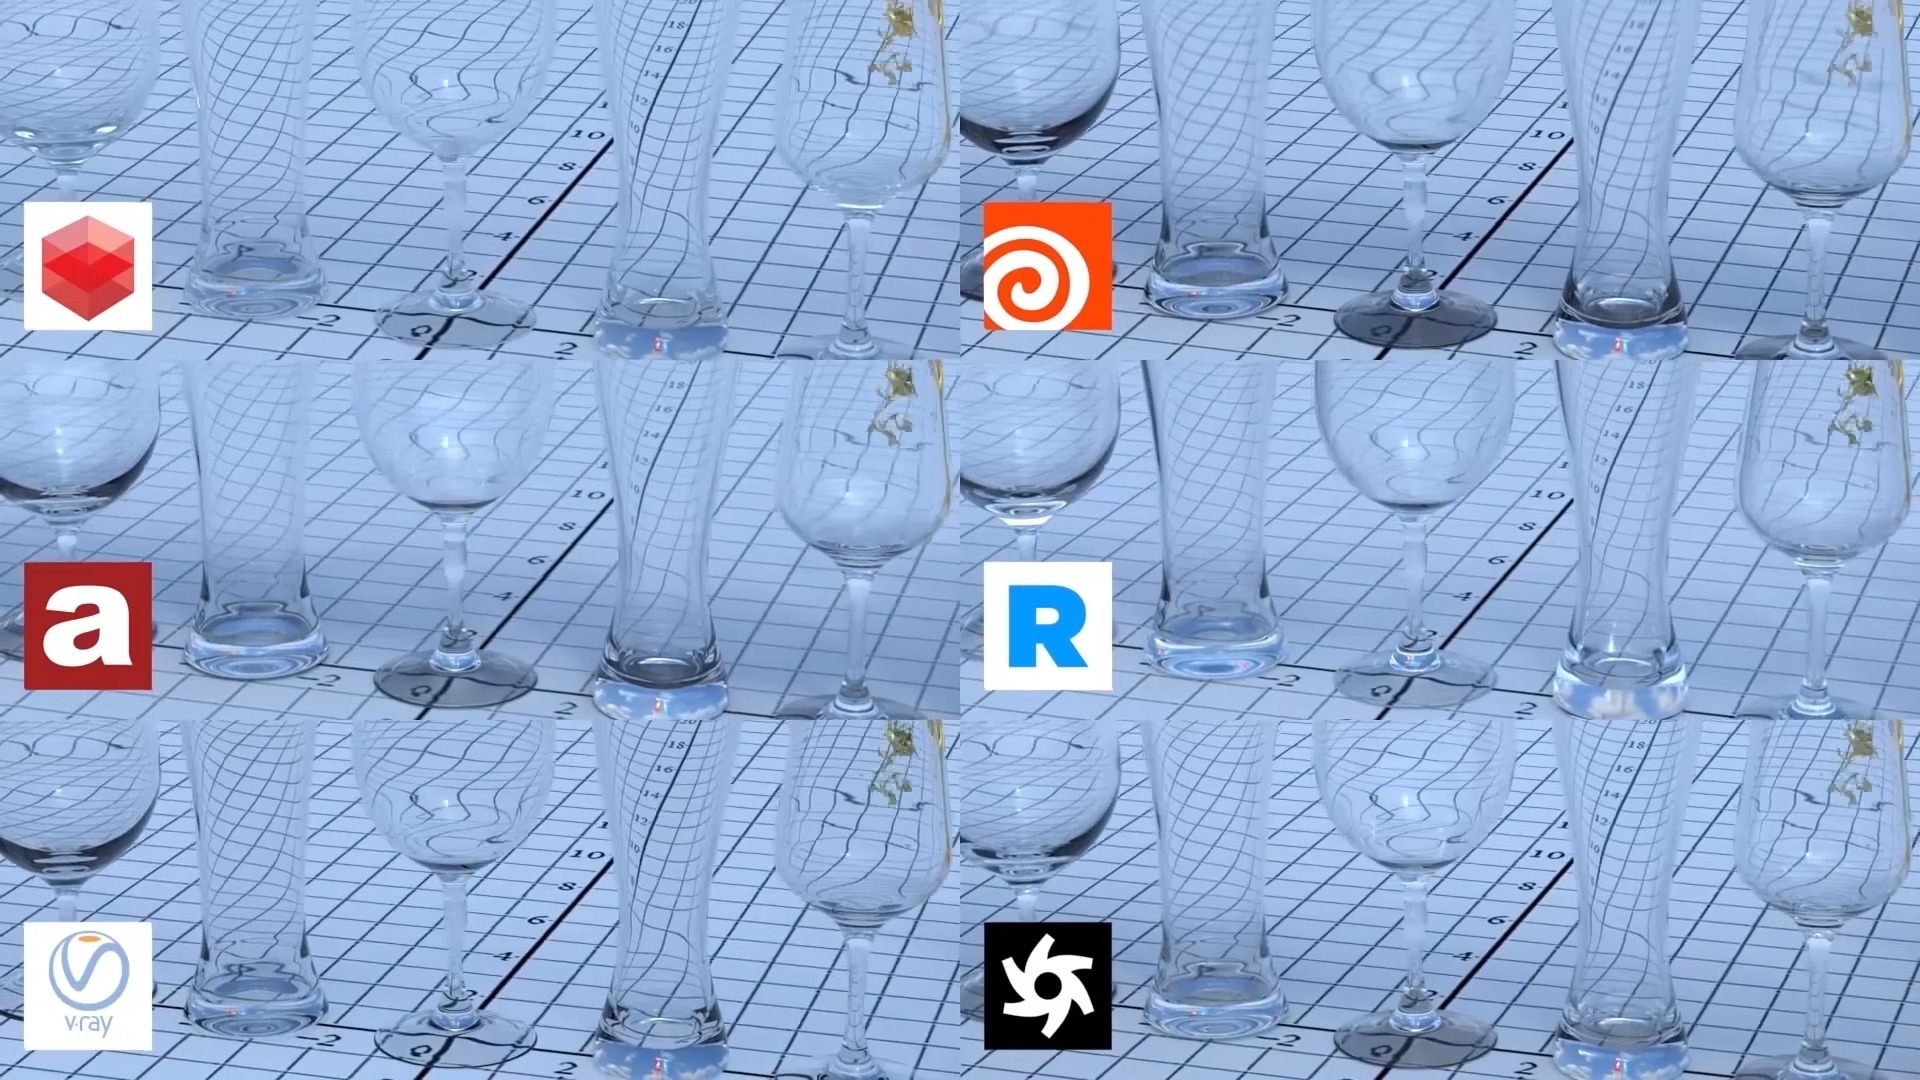 渲染效果与速度横评RS/Arnold/VRay/Houdini/RenderMan/OCtane - 知乎